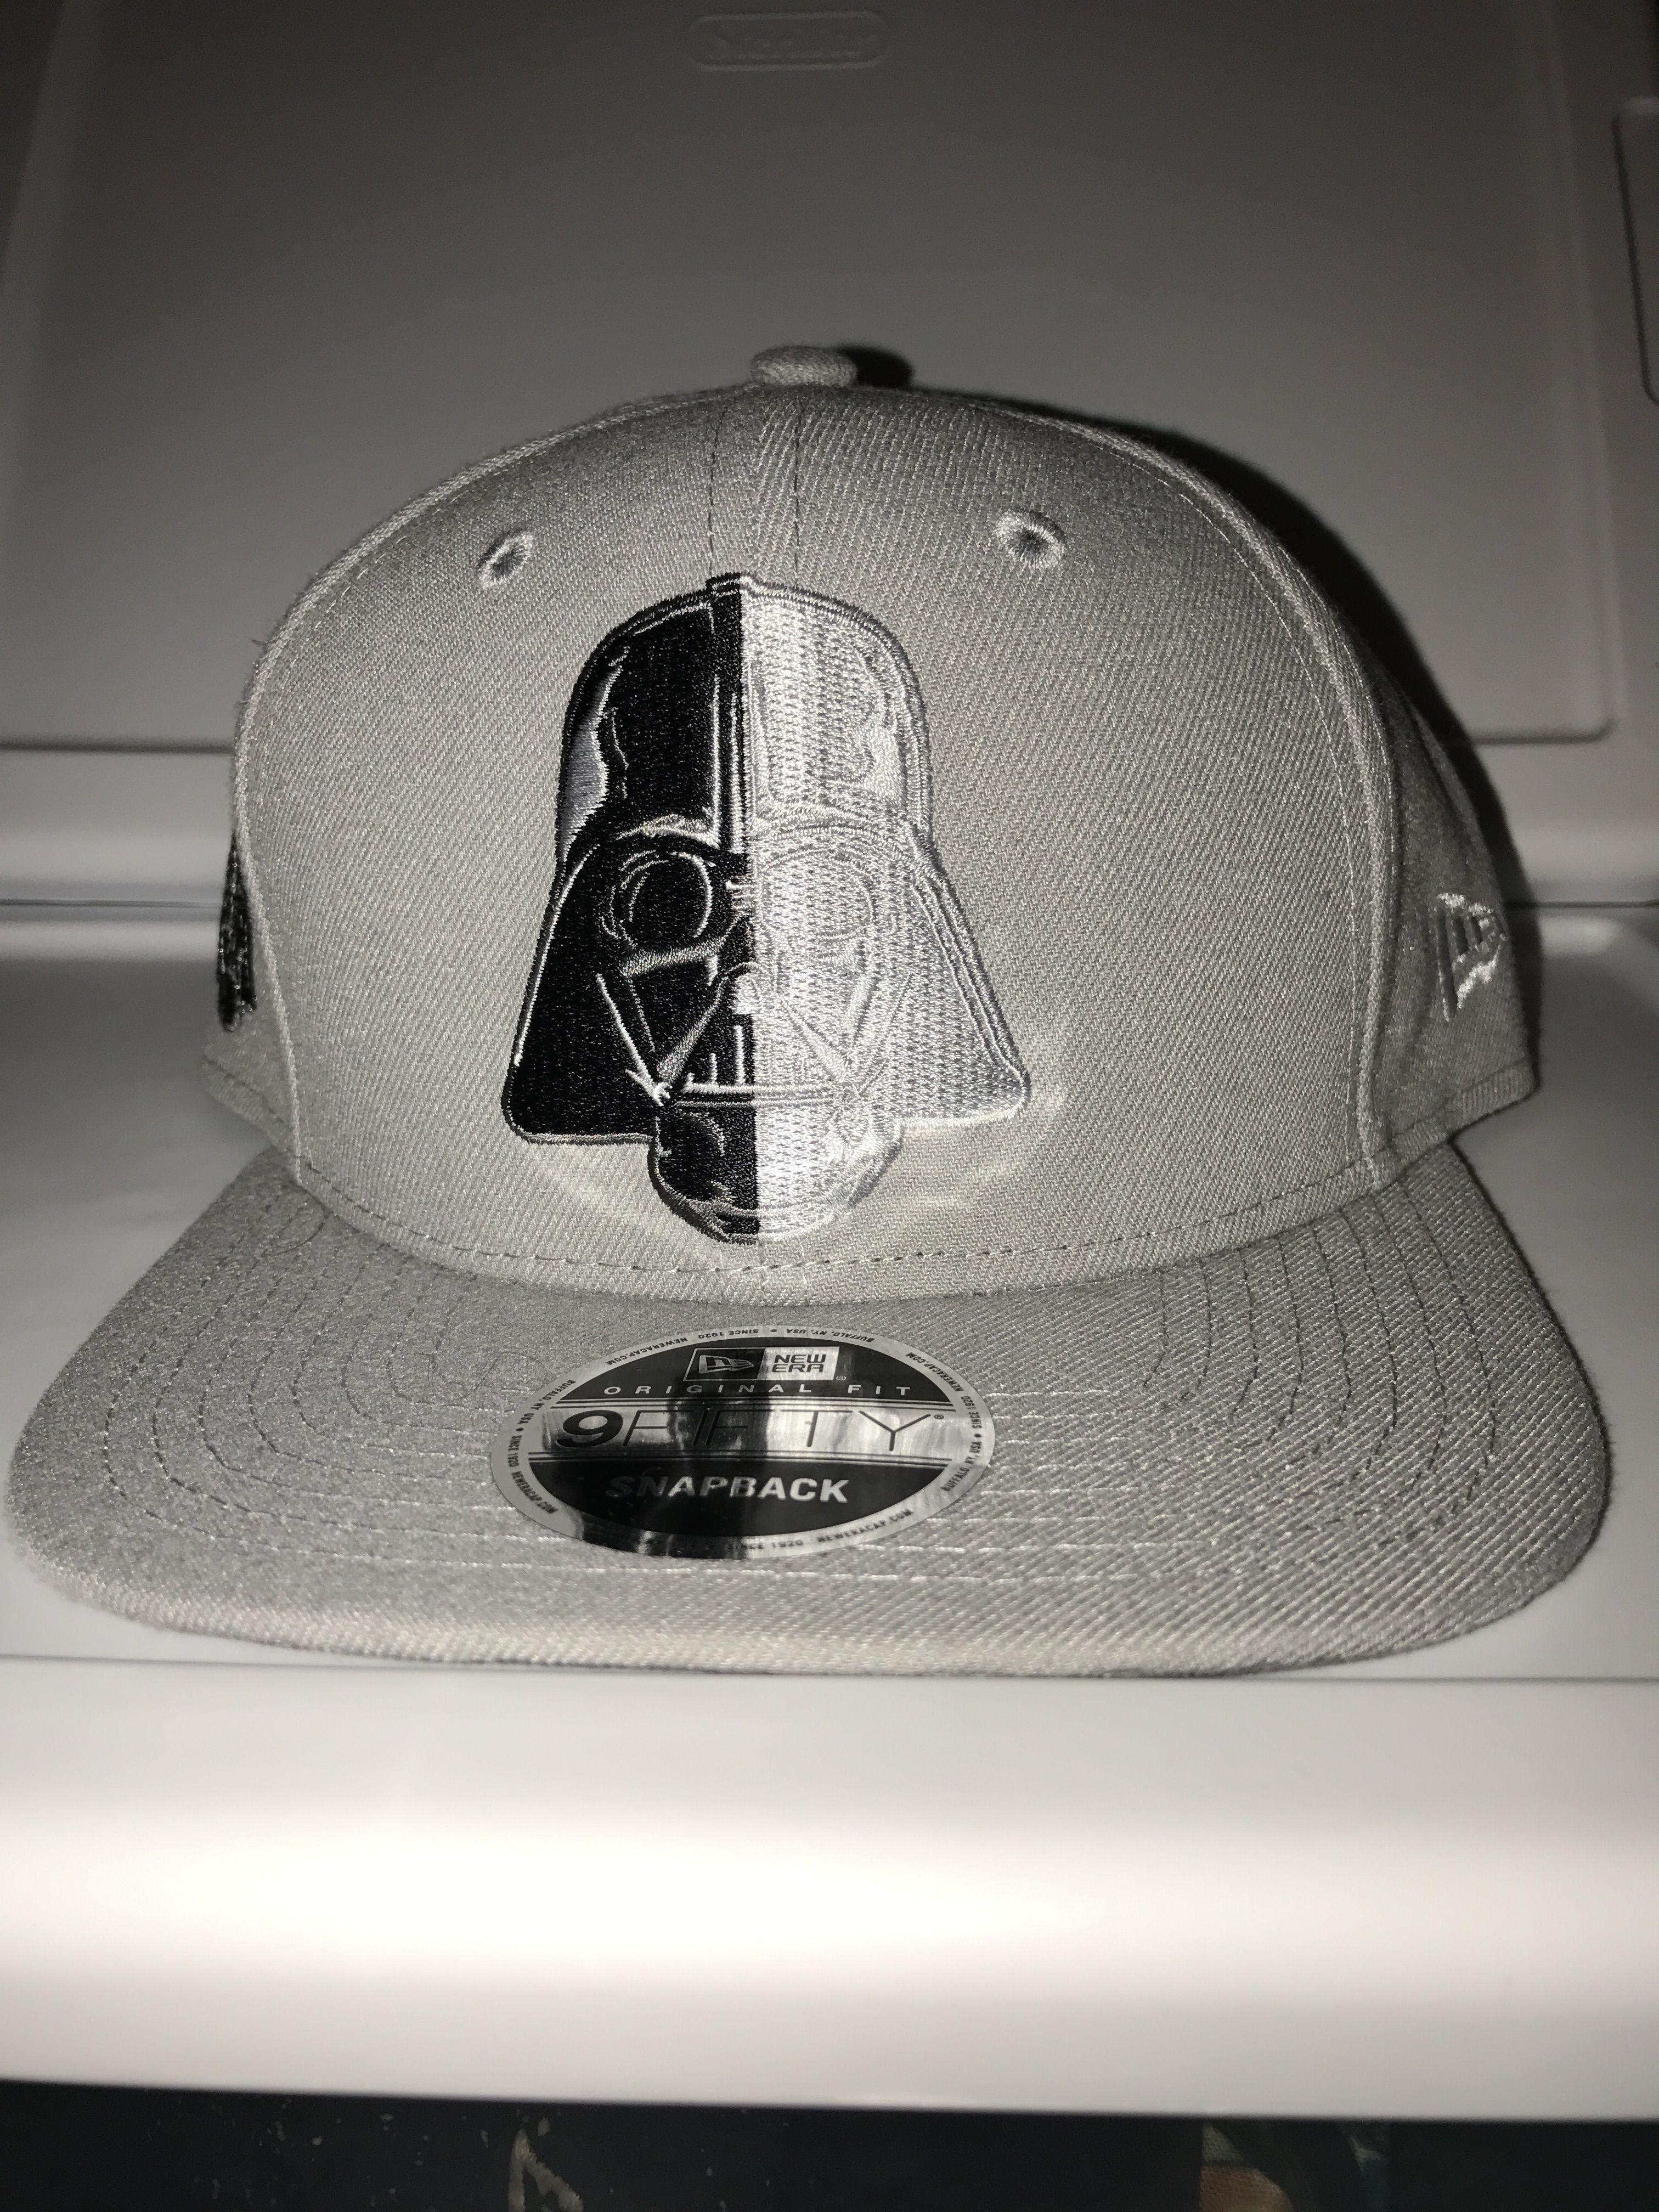 New era Star Wars Darth Vader split side with Darth Vader helmet on the side  snapback b9b02f2c5f17